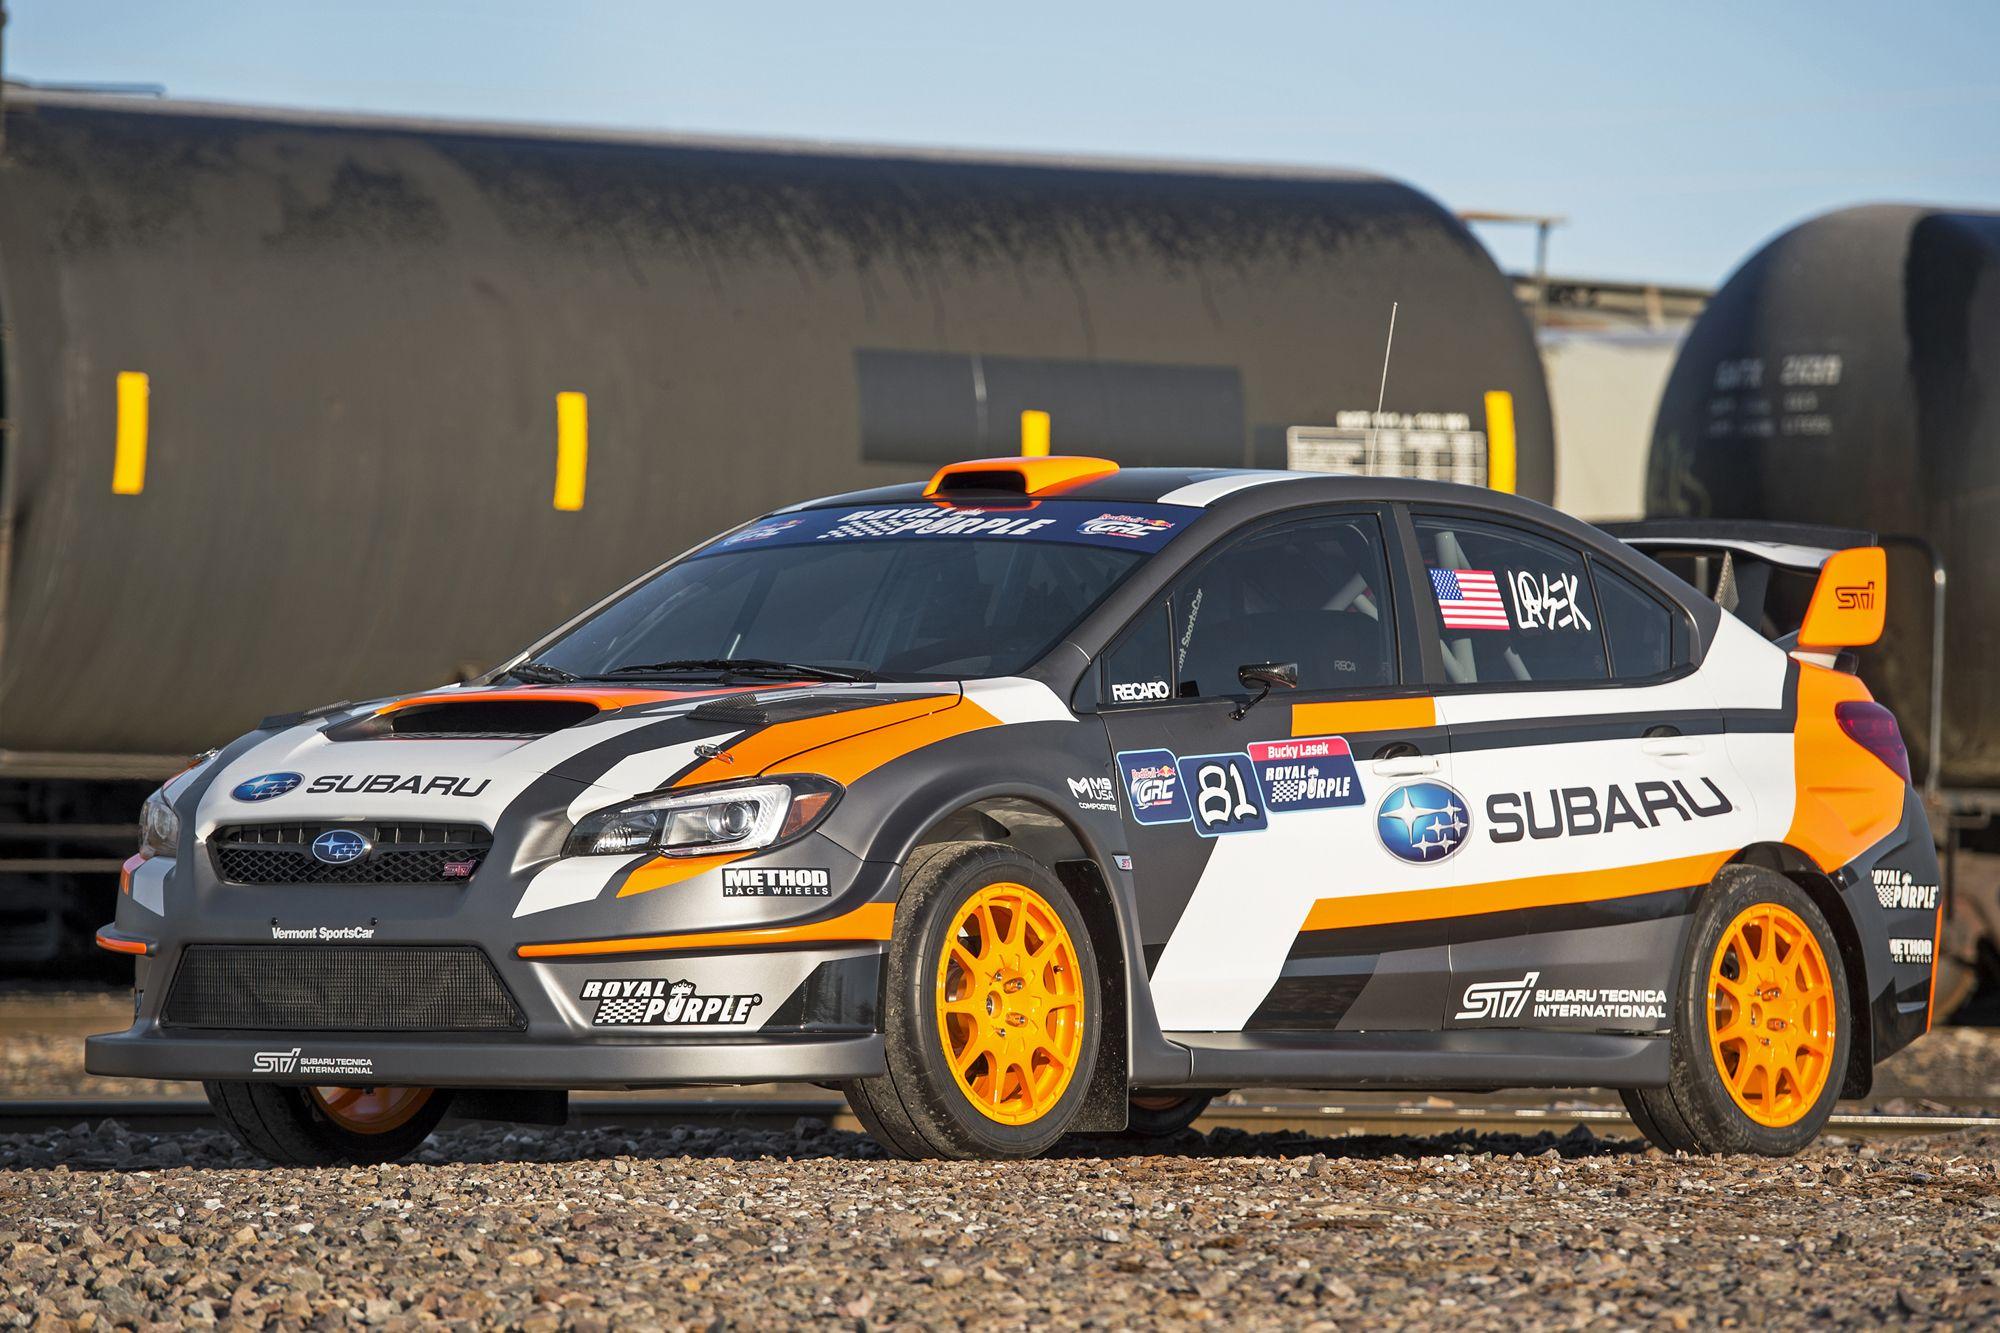 580-hp Subaru WRX STI Global Rallycross car revealed